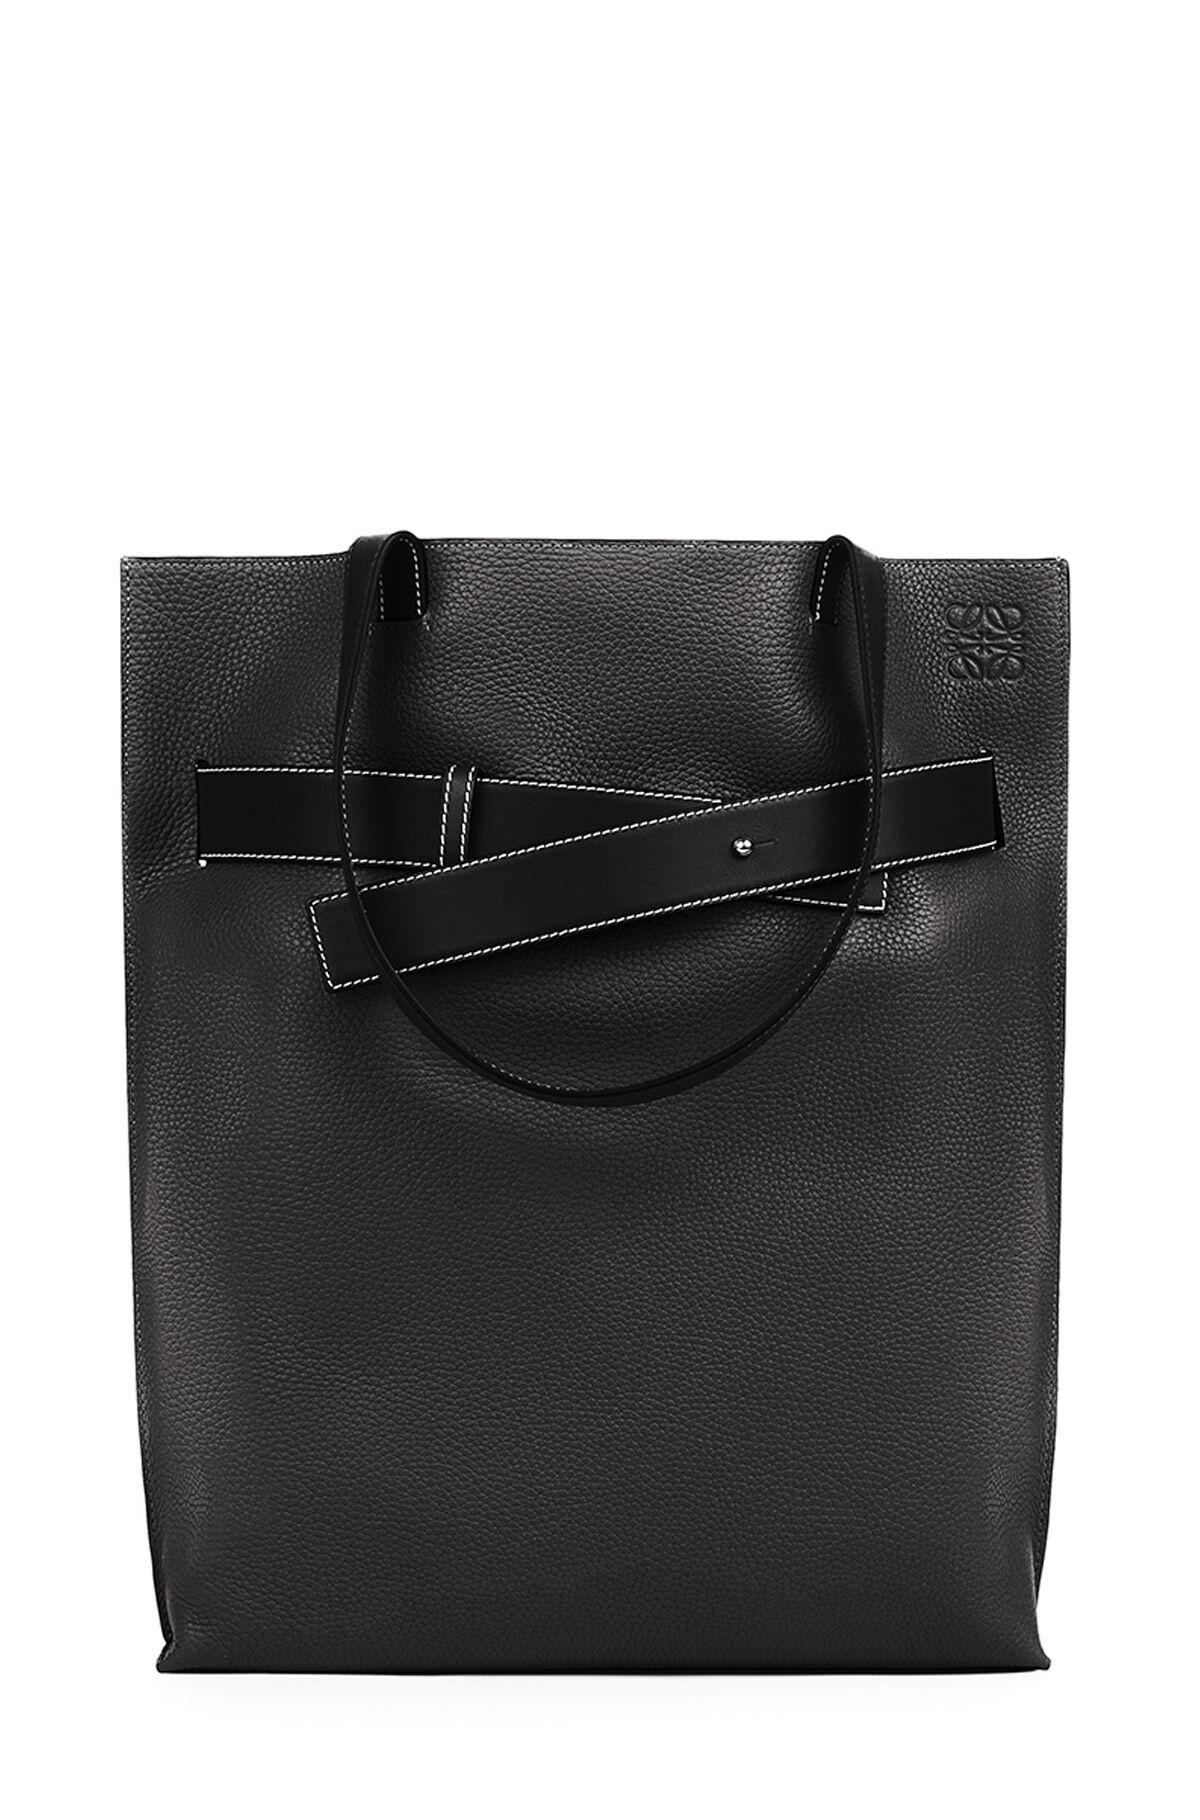 LOEWE Strap Vertical Tote Bag 黑色 all